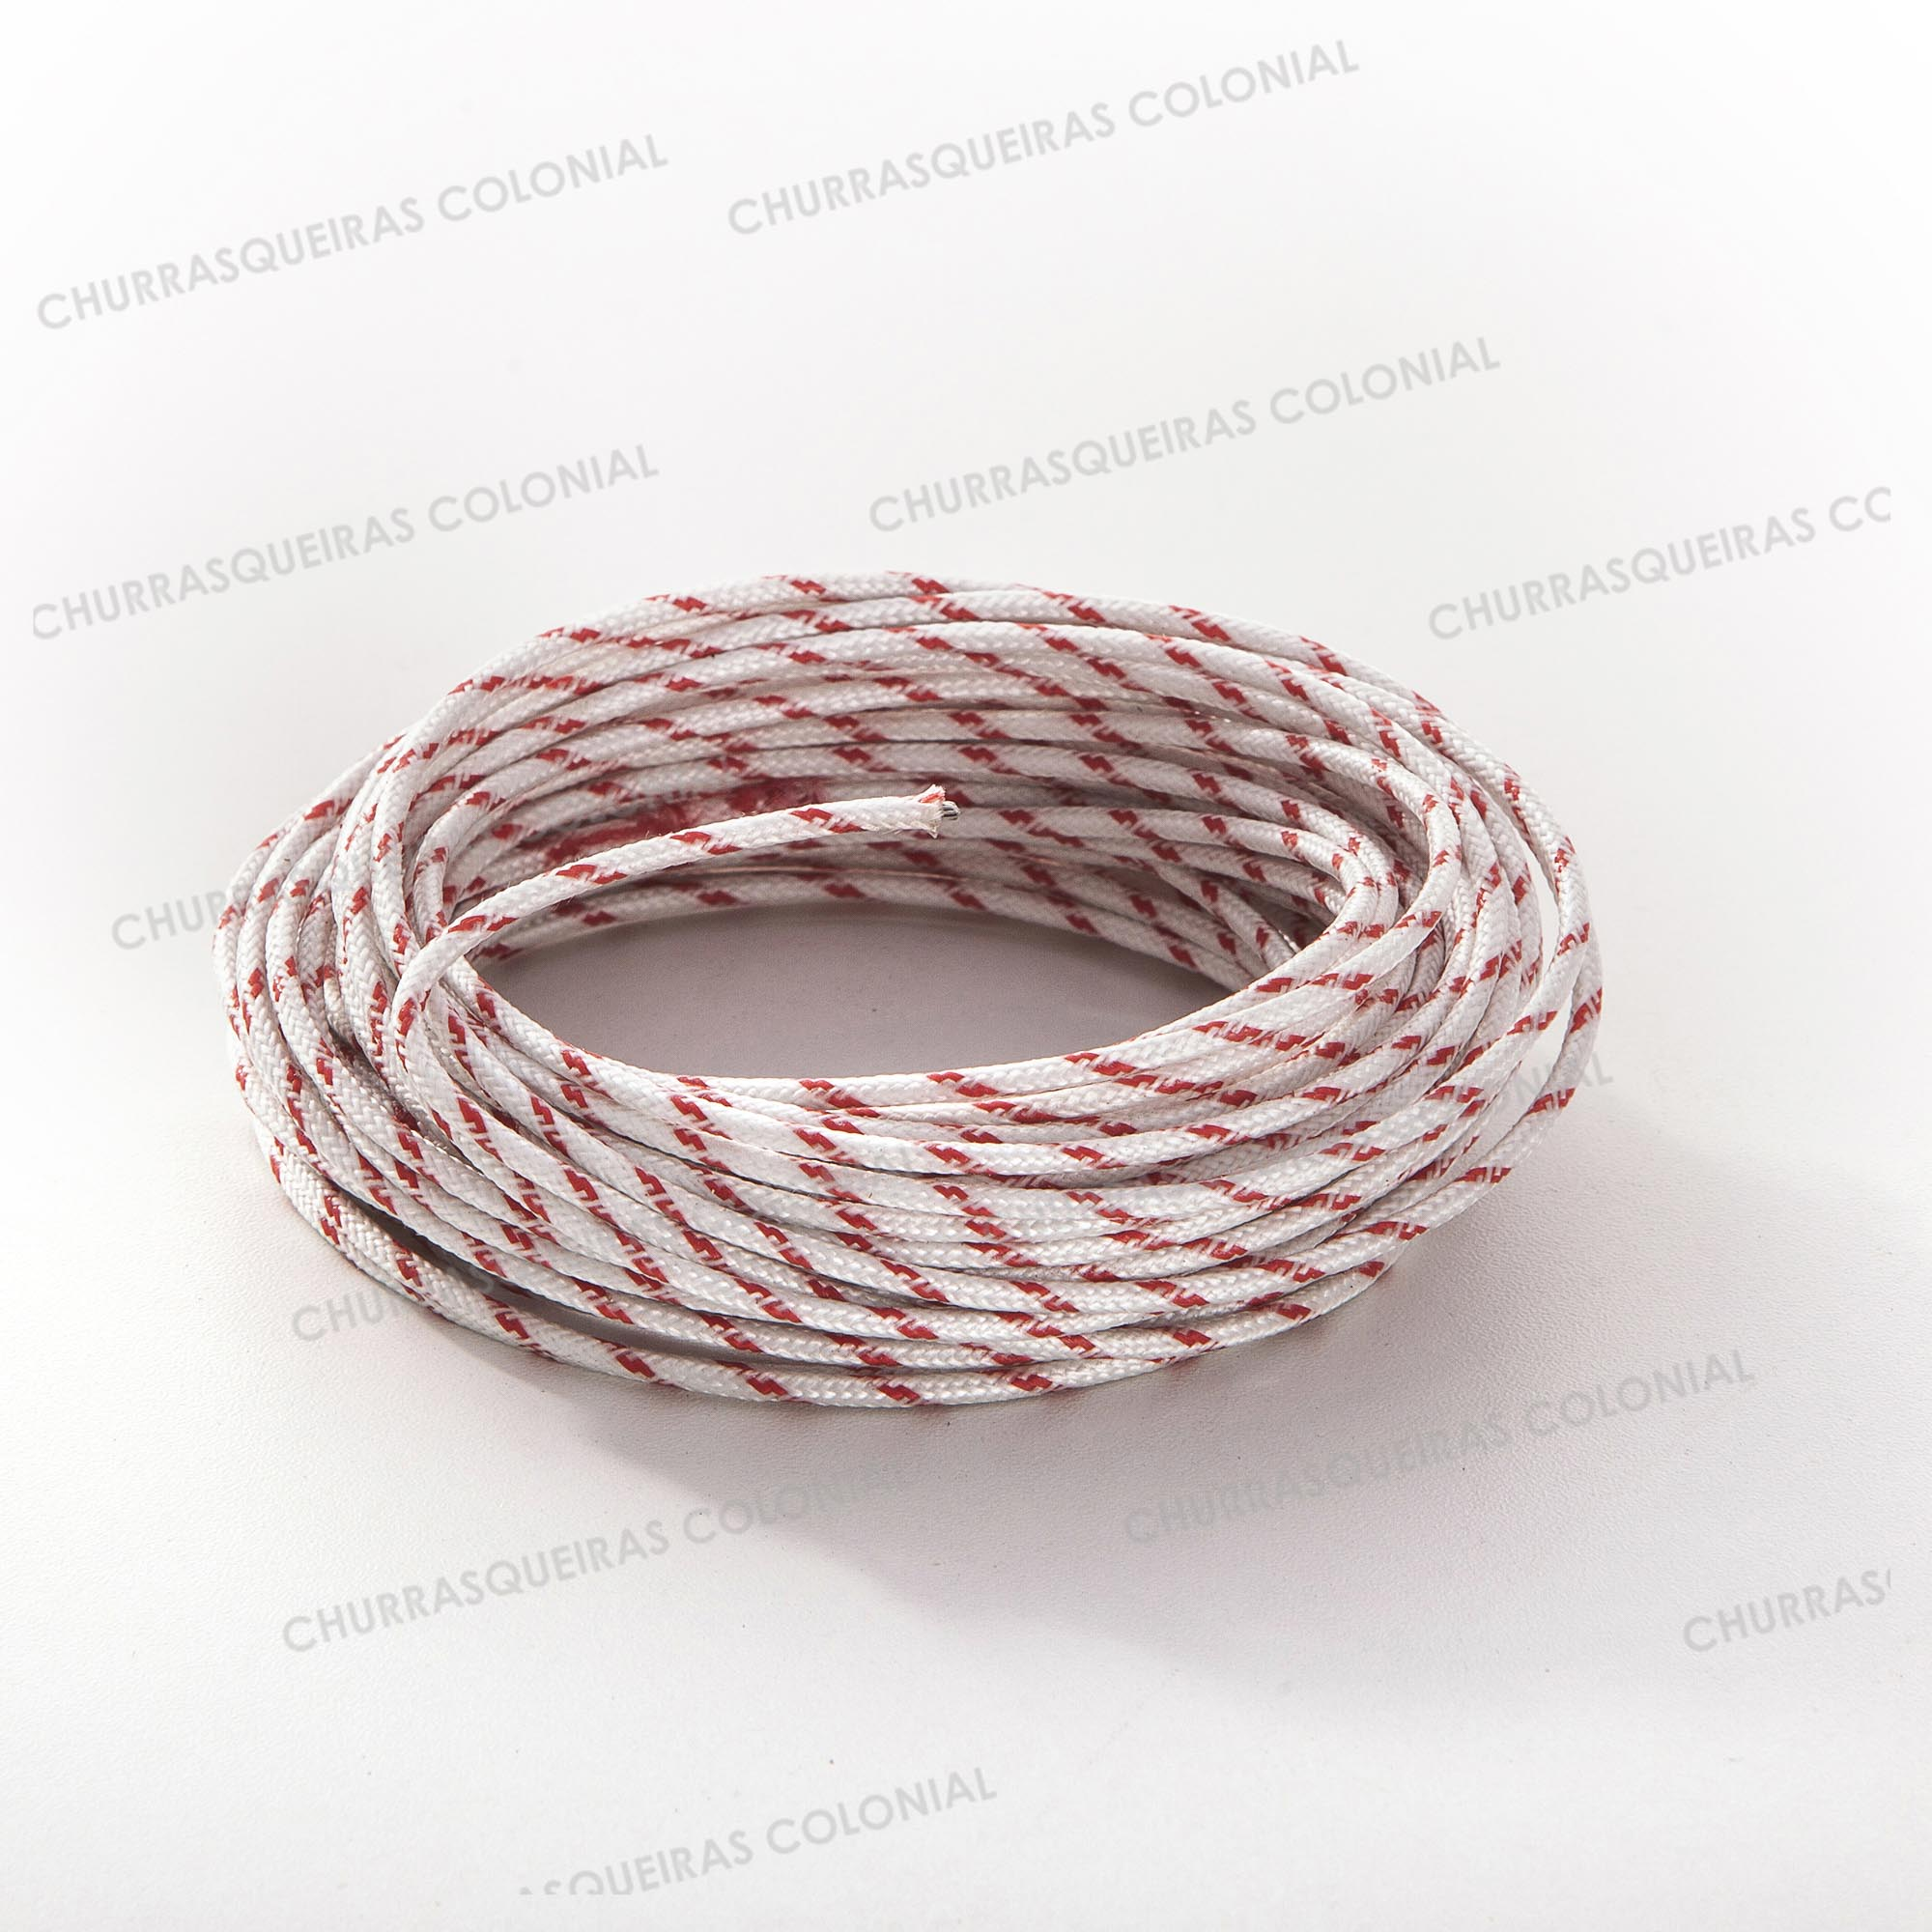 Cabo Semi Flexível 1,5 mm² Hibrido Fibra Silicone 10 metros